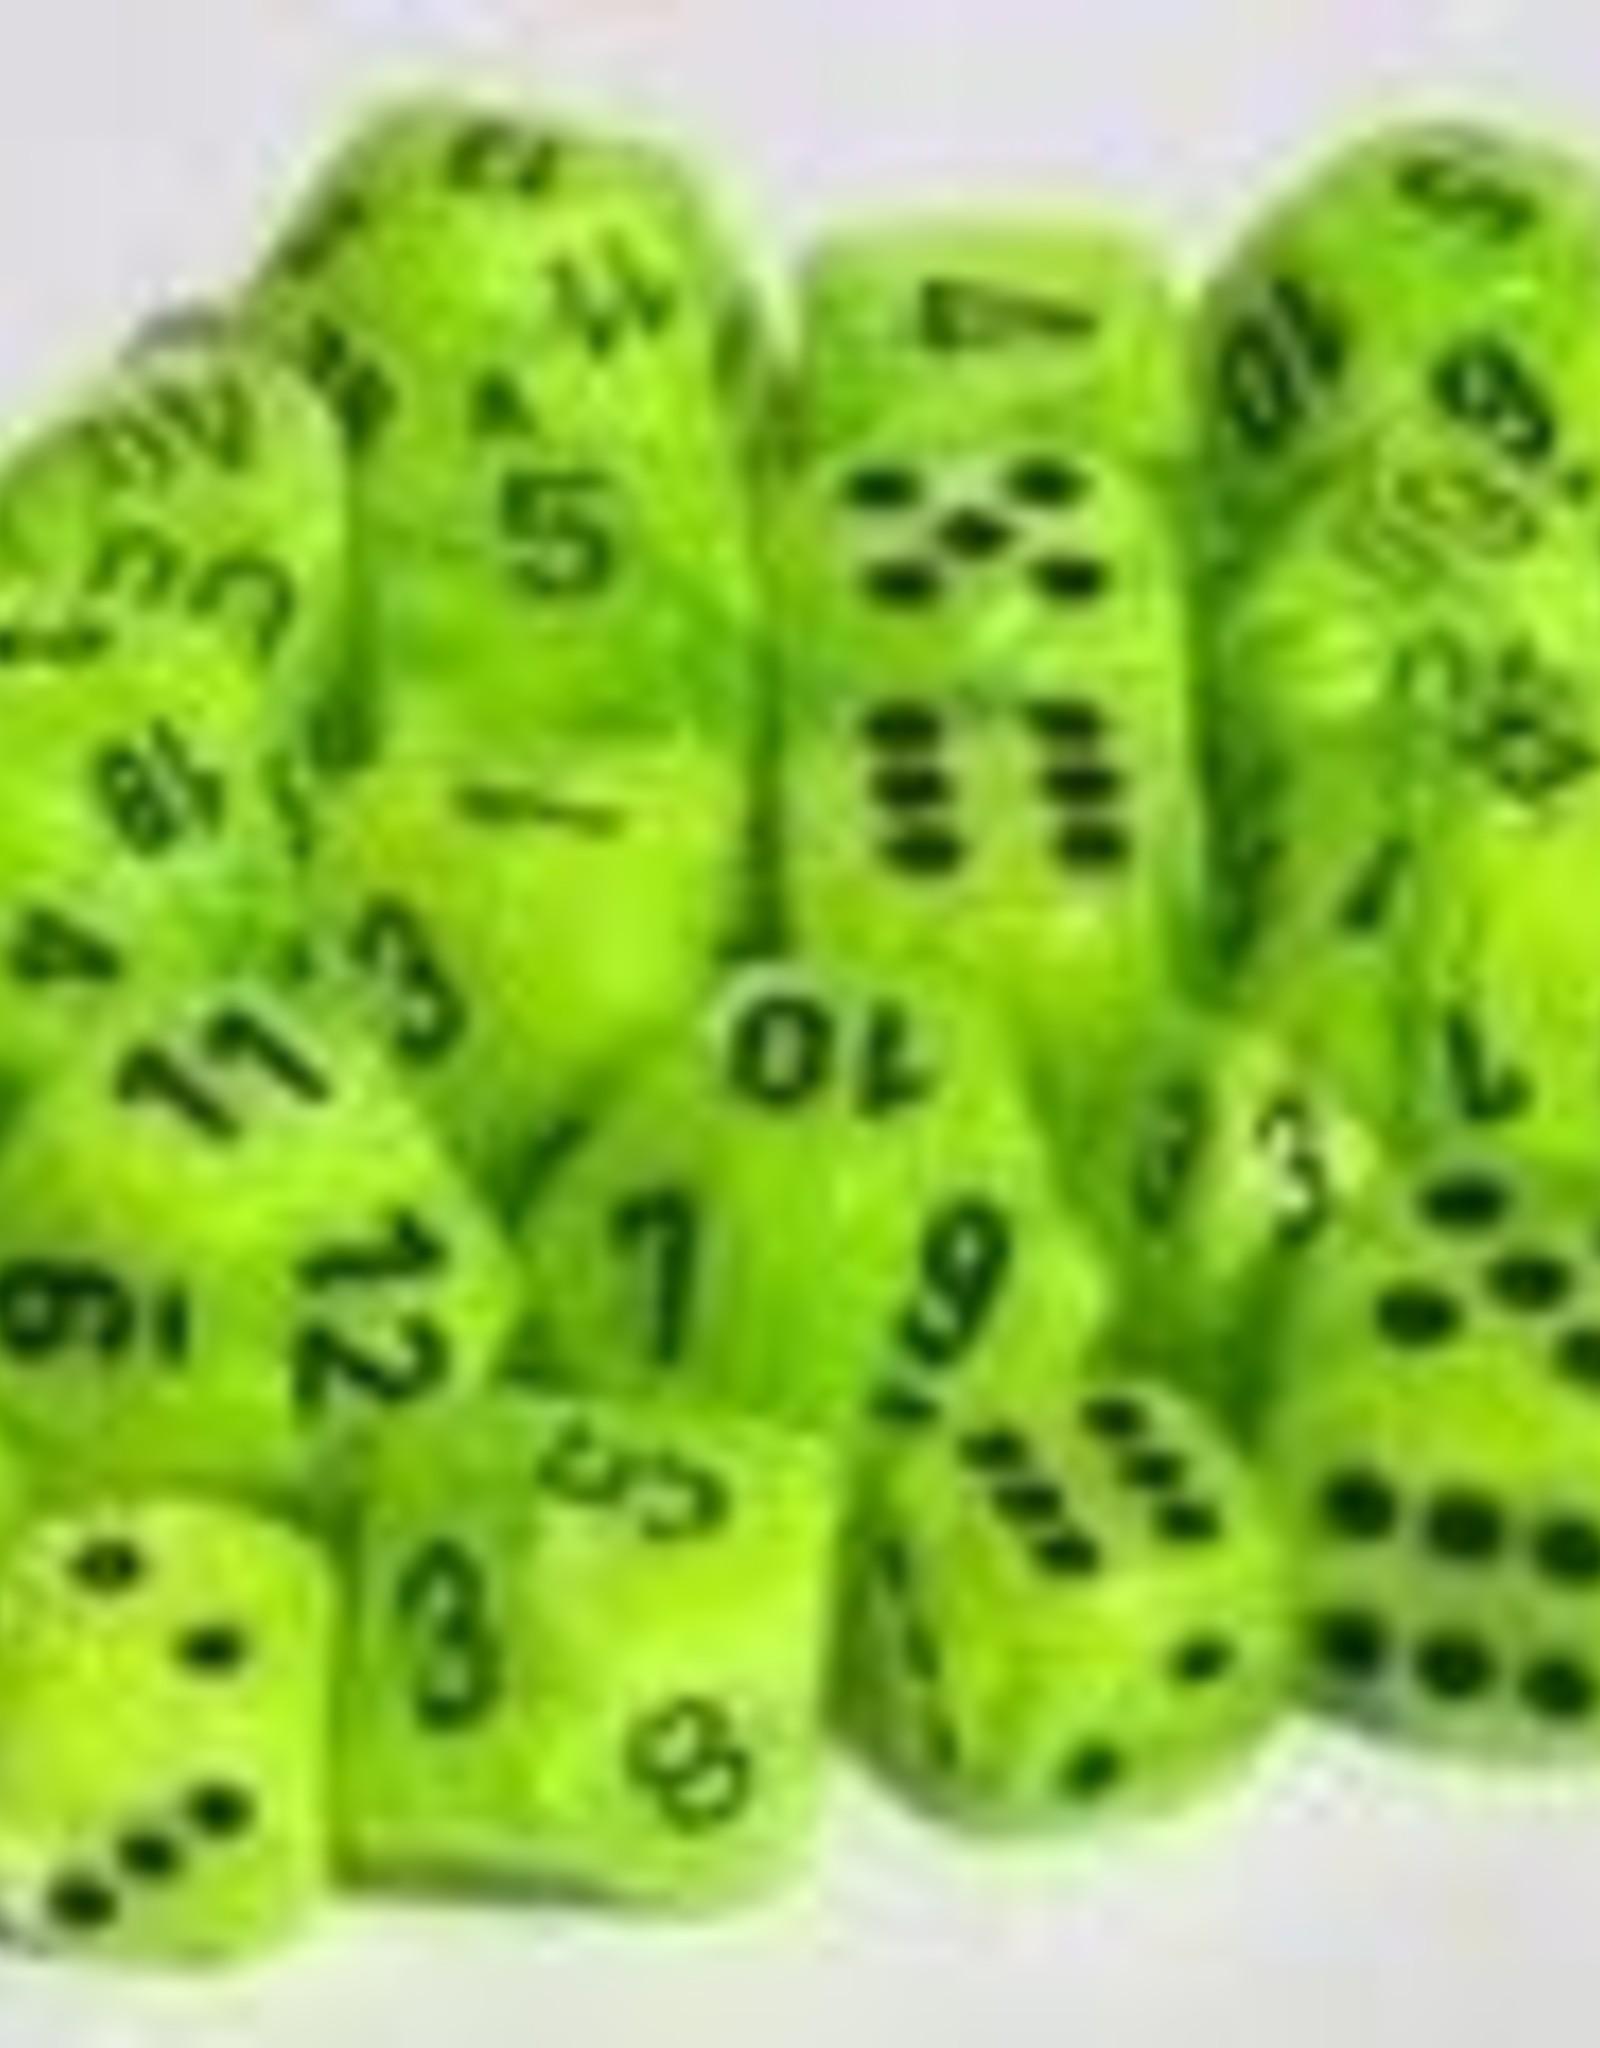 Chessex Bright Green w/black Vortex 12mm d6 dice set